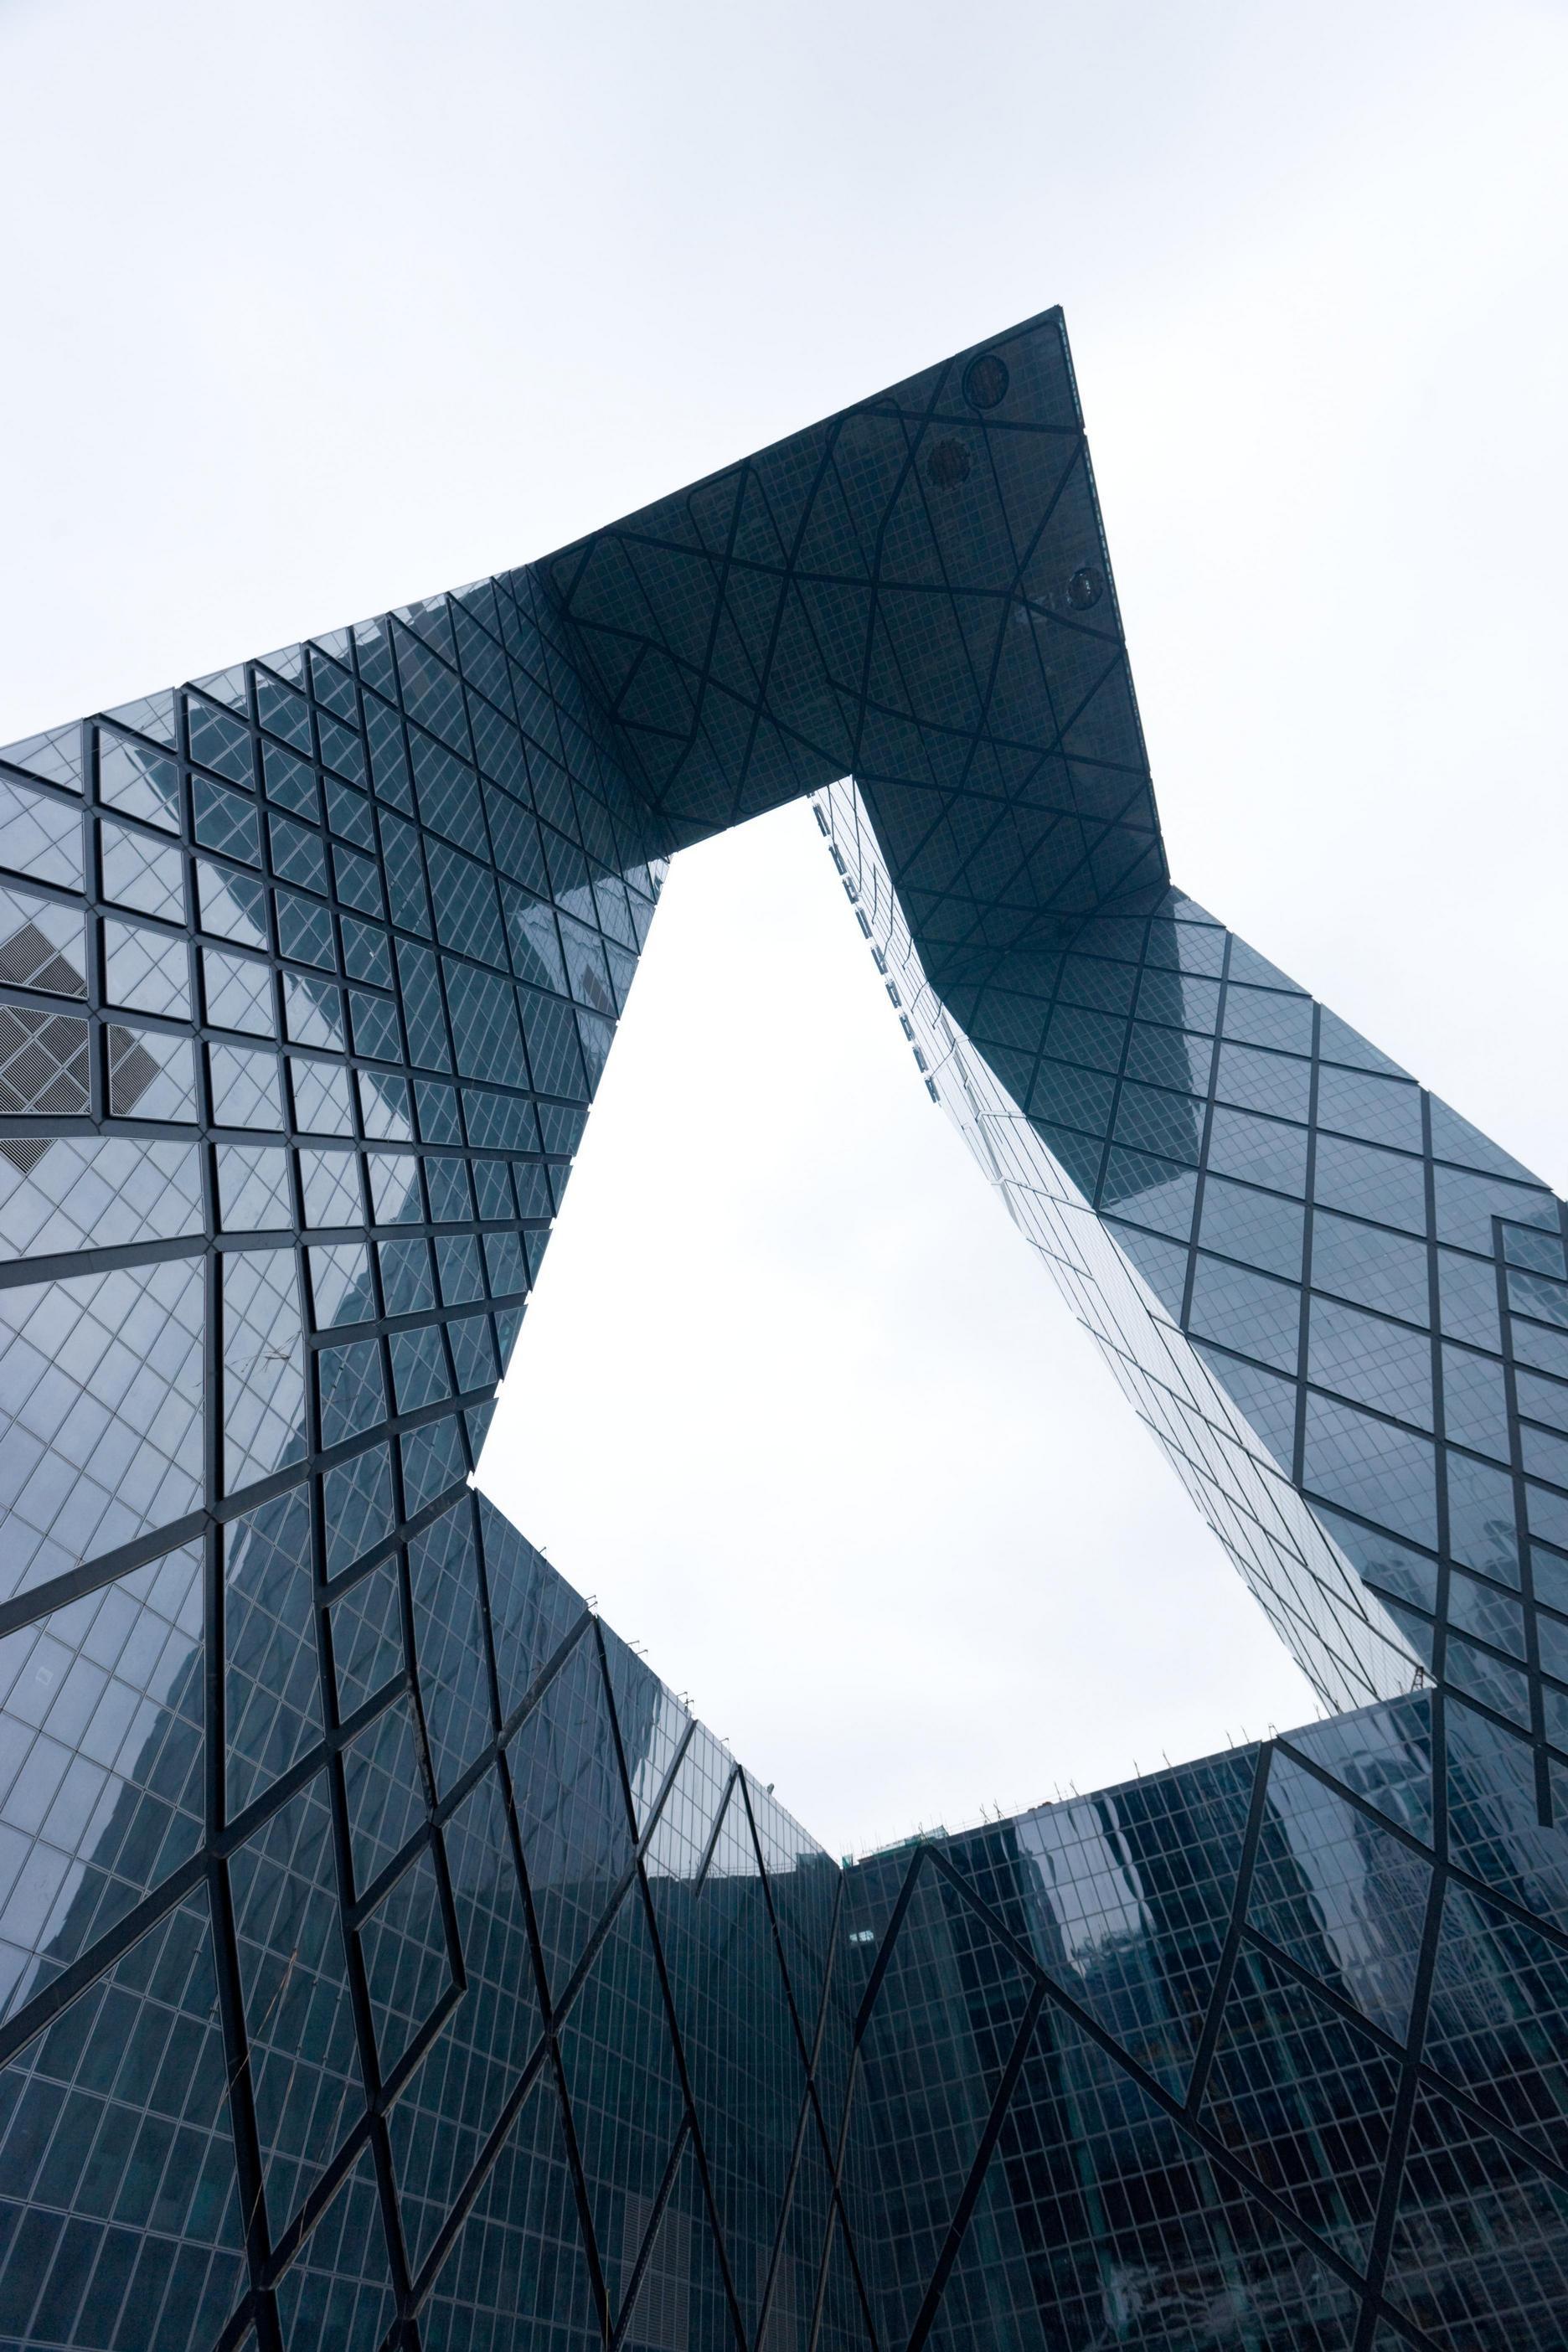 china beijing cctv skyscraper architecture design iphone7 retina